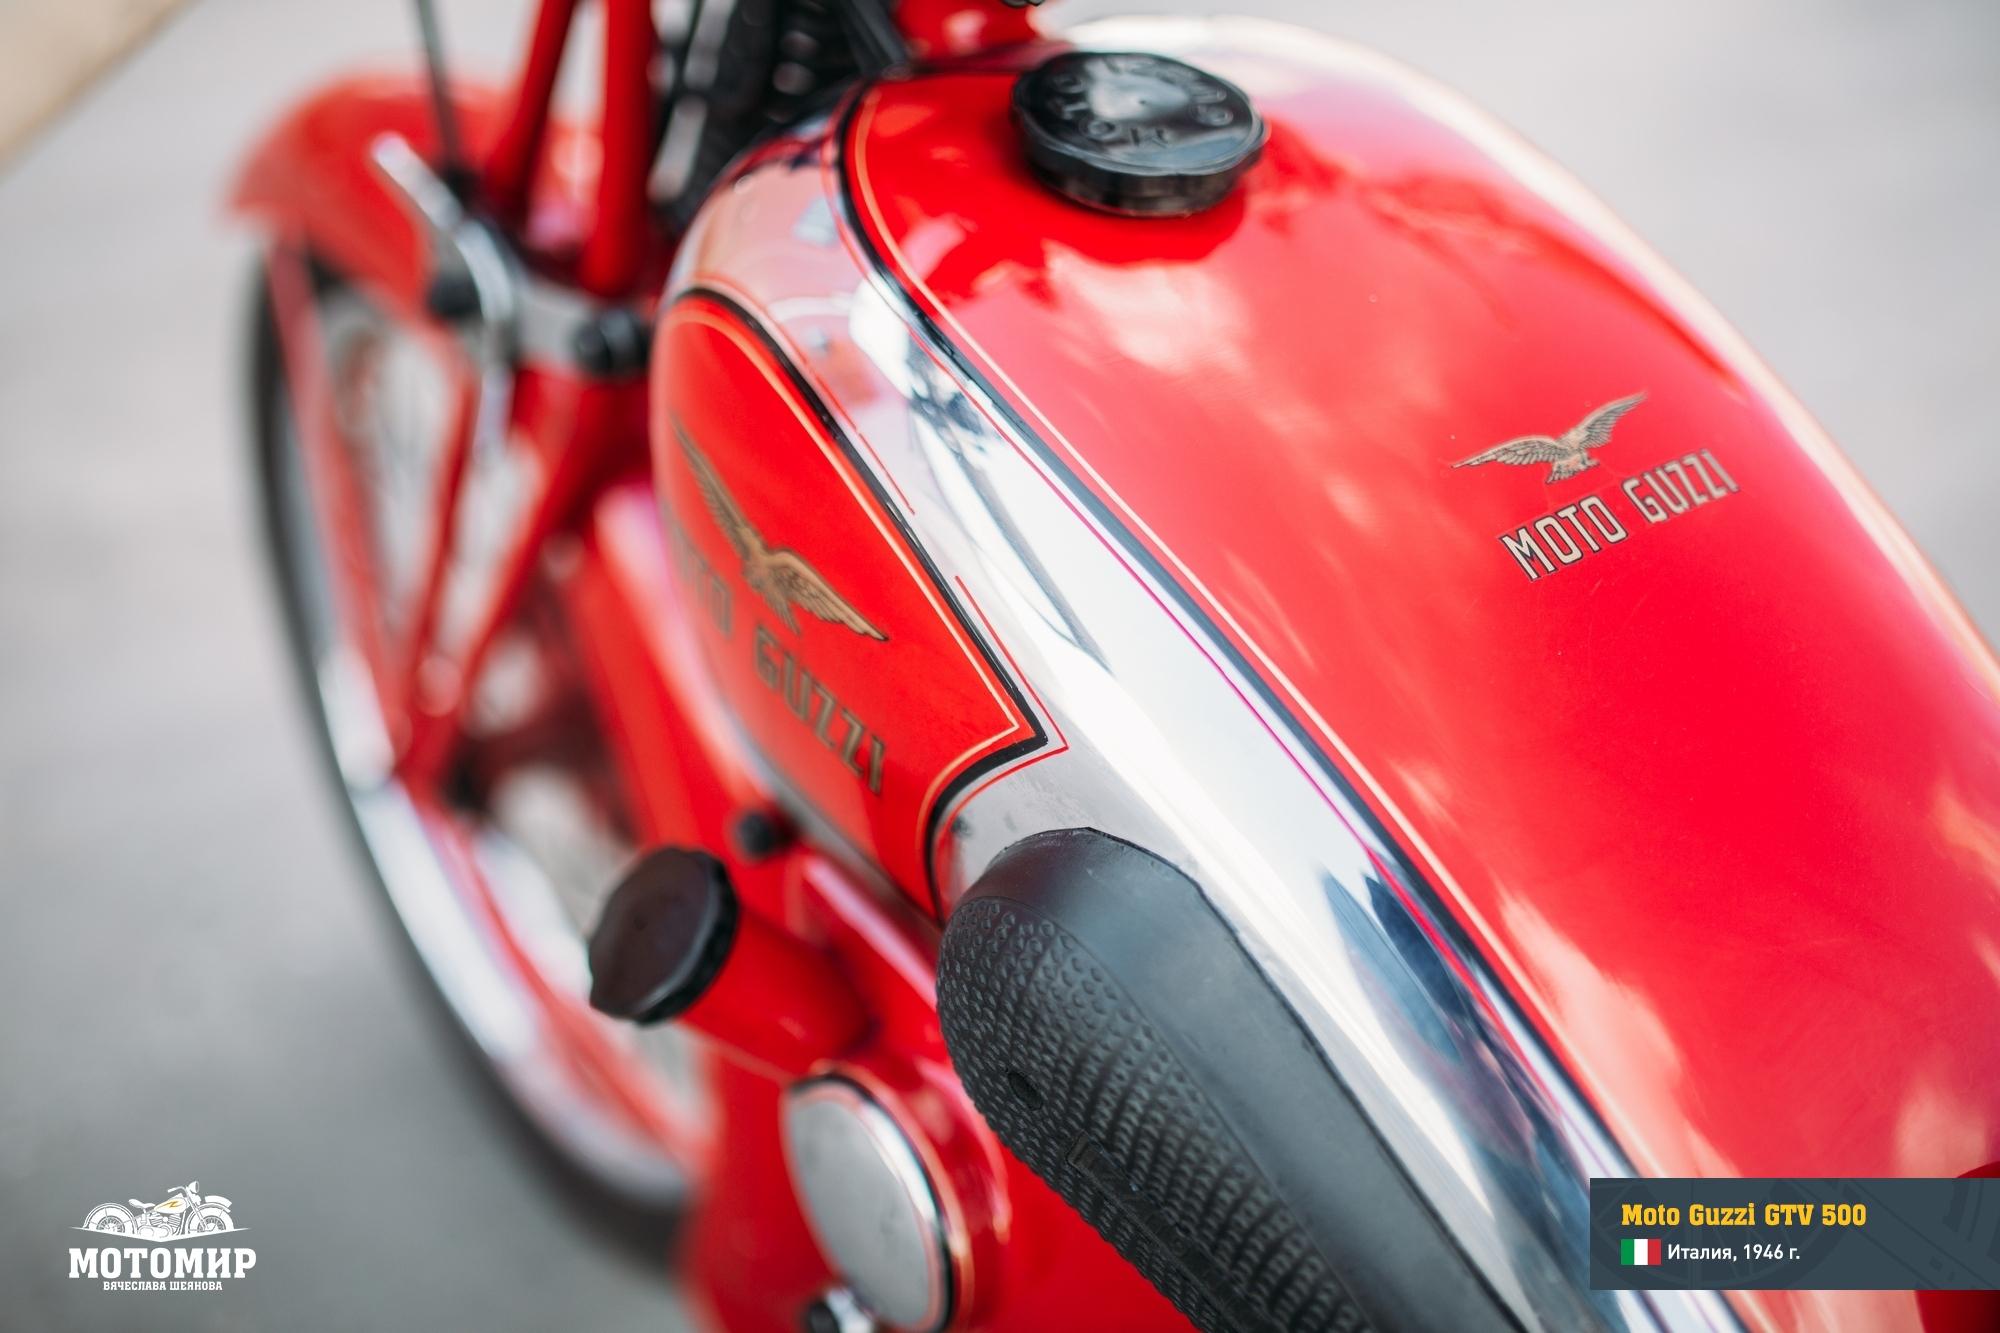 moto-guzzi-gtv-500-201509-web-27